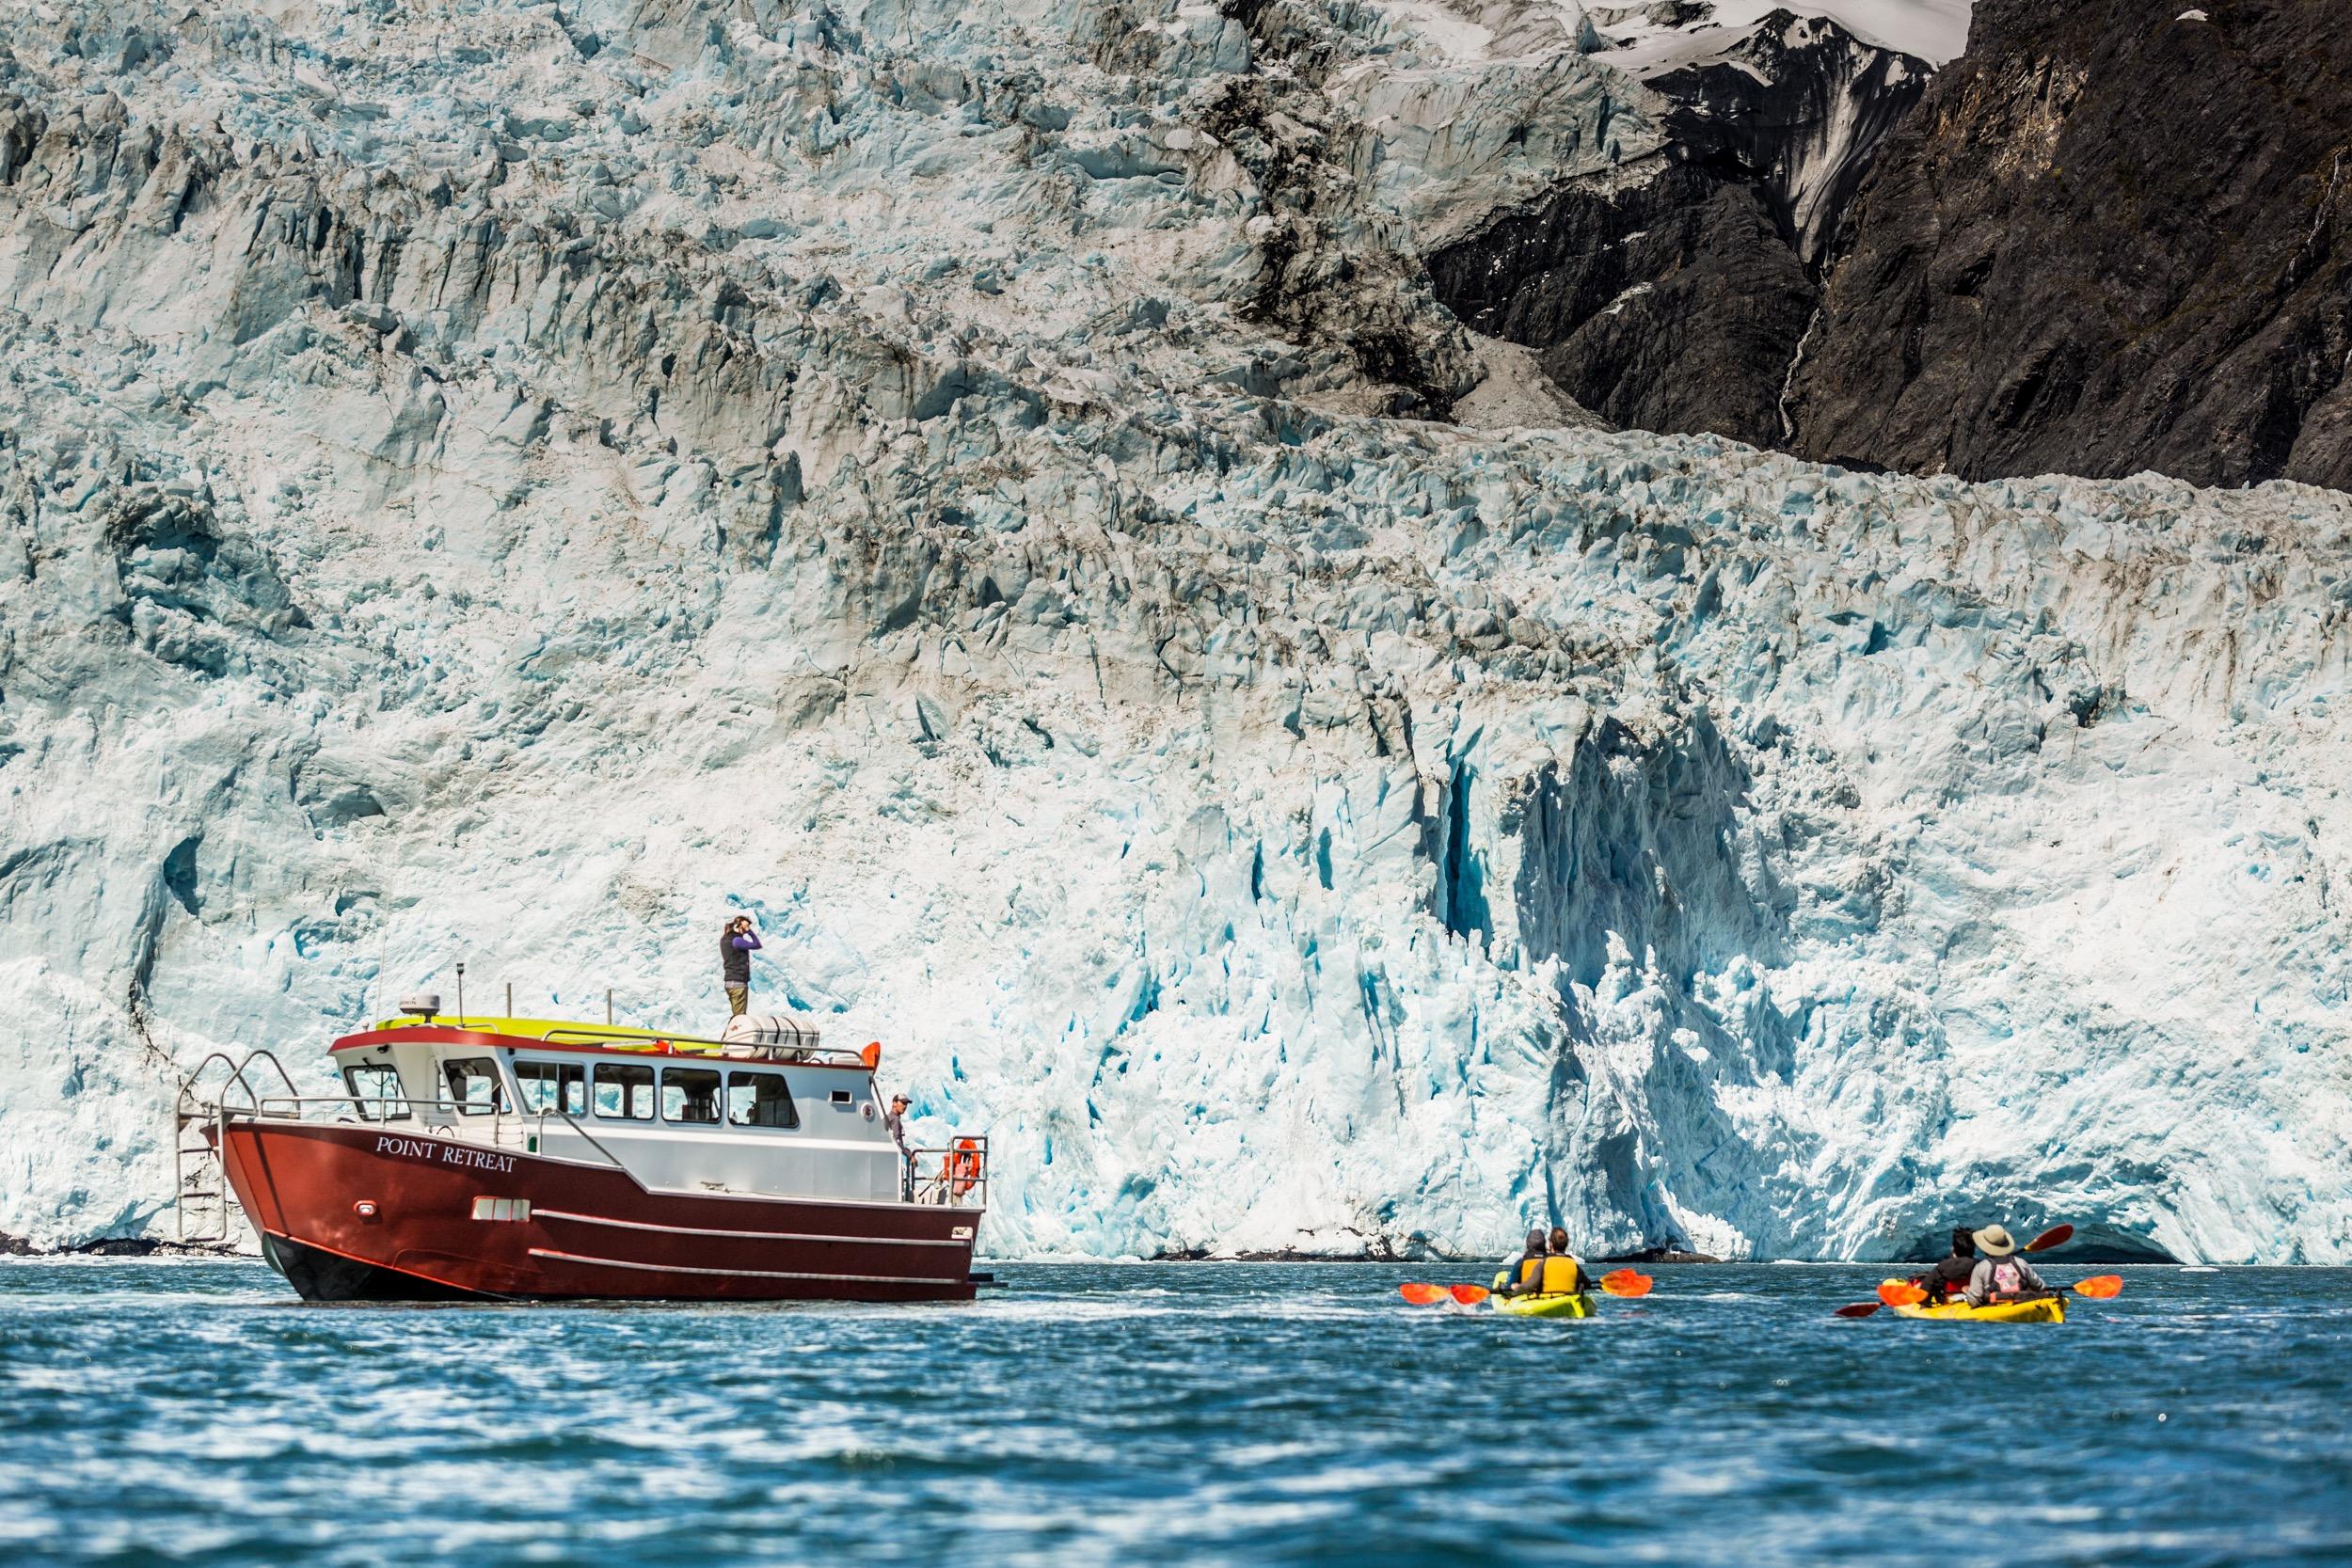 Grand Day Wildlife Cruise & Glacier Kayak Tour - 7:30 am - 4:30 pm, ages 8+5/15/19 - 9/2/195 hr Wildlife Cruise3 hr Glacier Kayaking Picnic LunchHighlightsKenai Fjords NP, Glaciers, Marine Mammals, Sea Birds